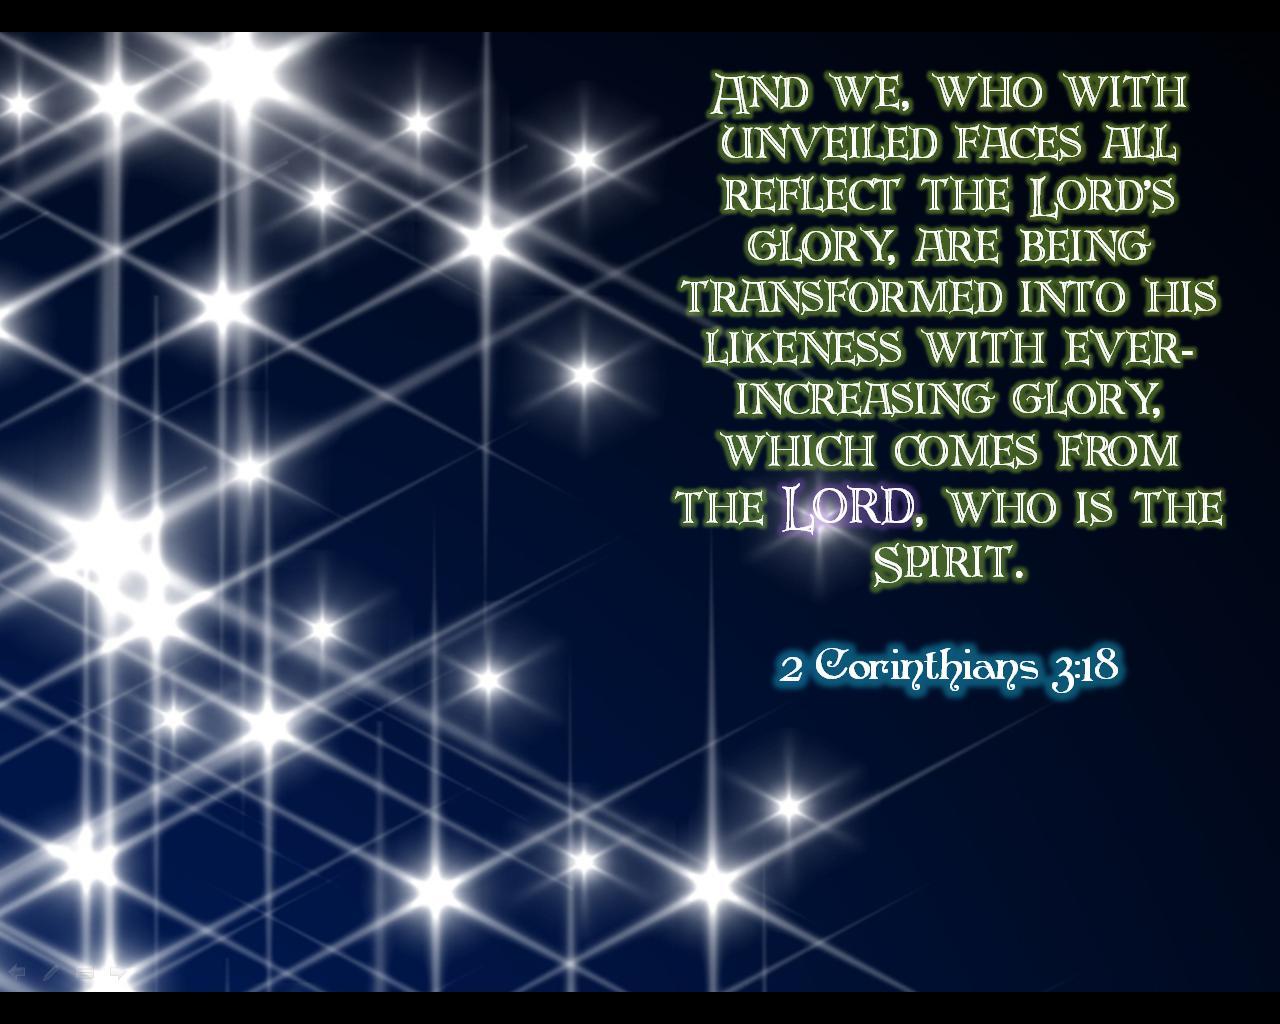 Bible Verse Wallpaper Iphone 6 2 Corinthians 3 18 Wallpaper Christian Wallpapers And